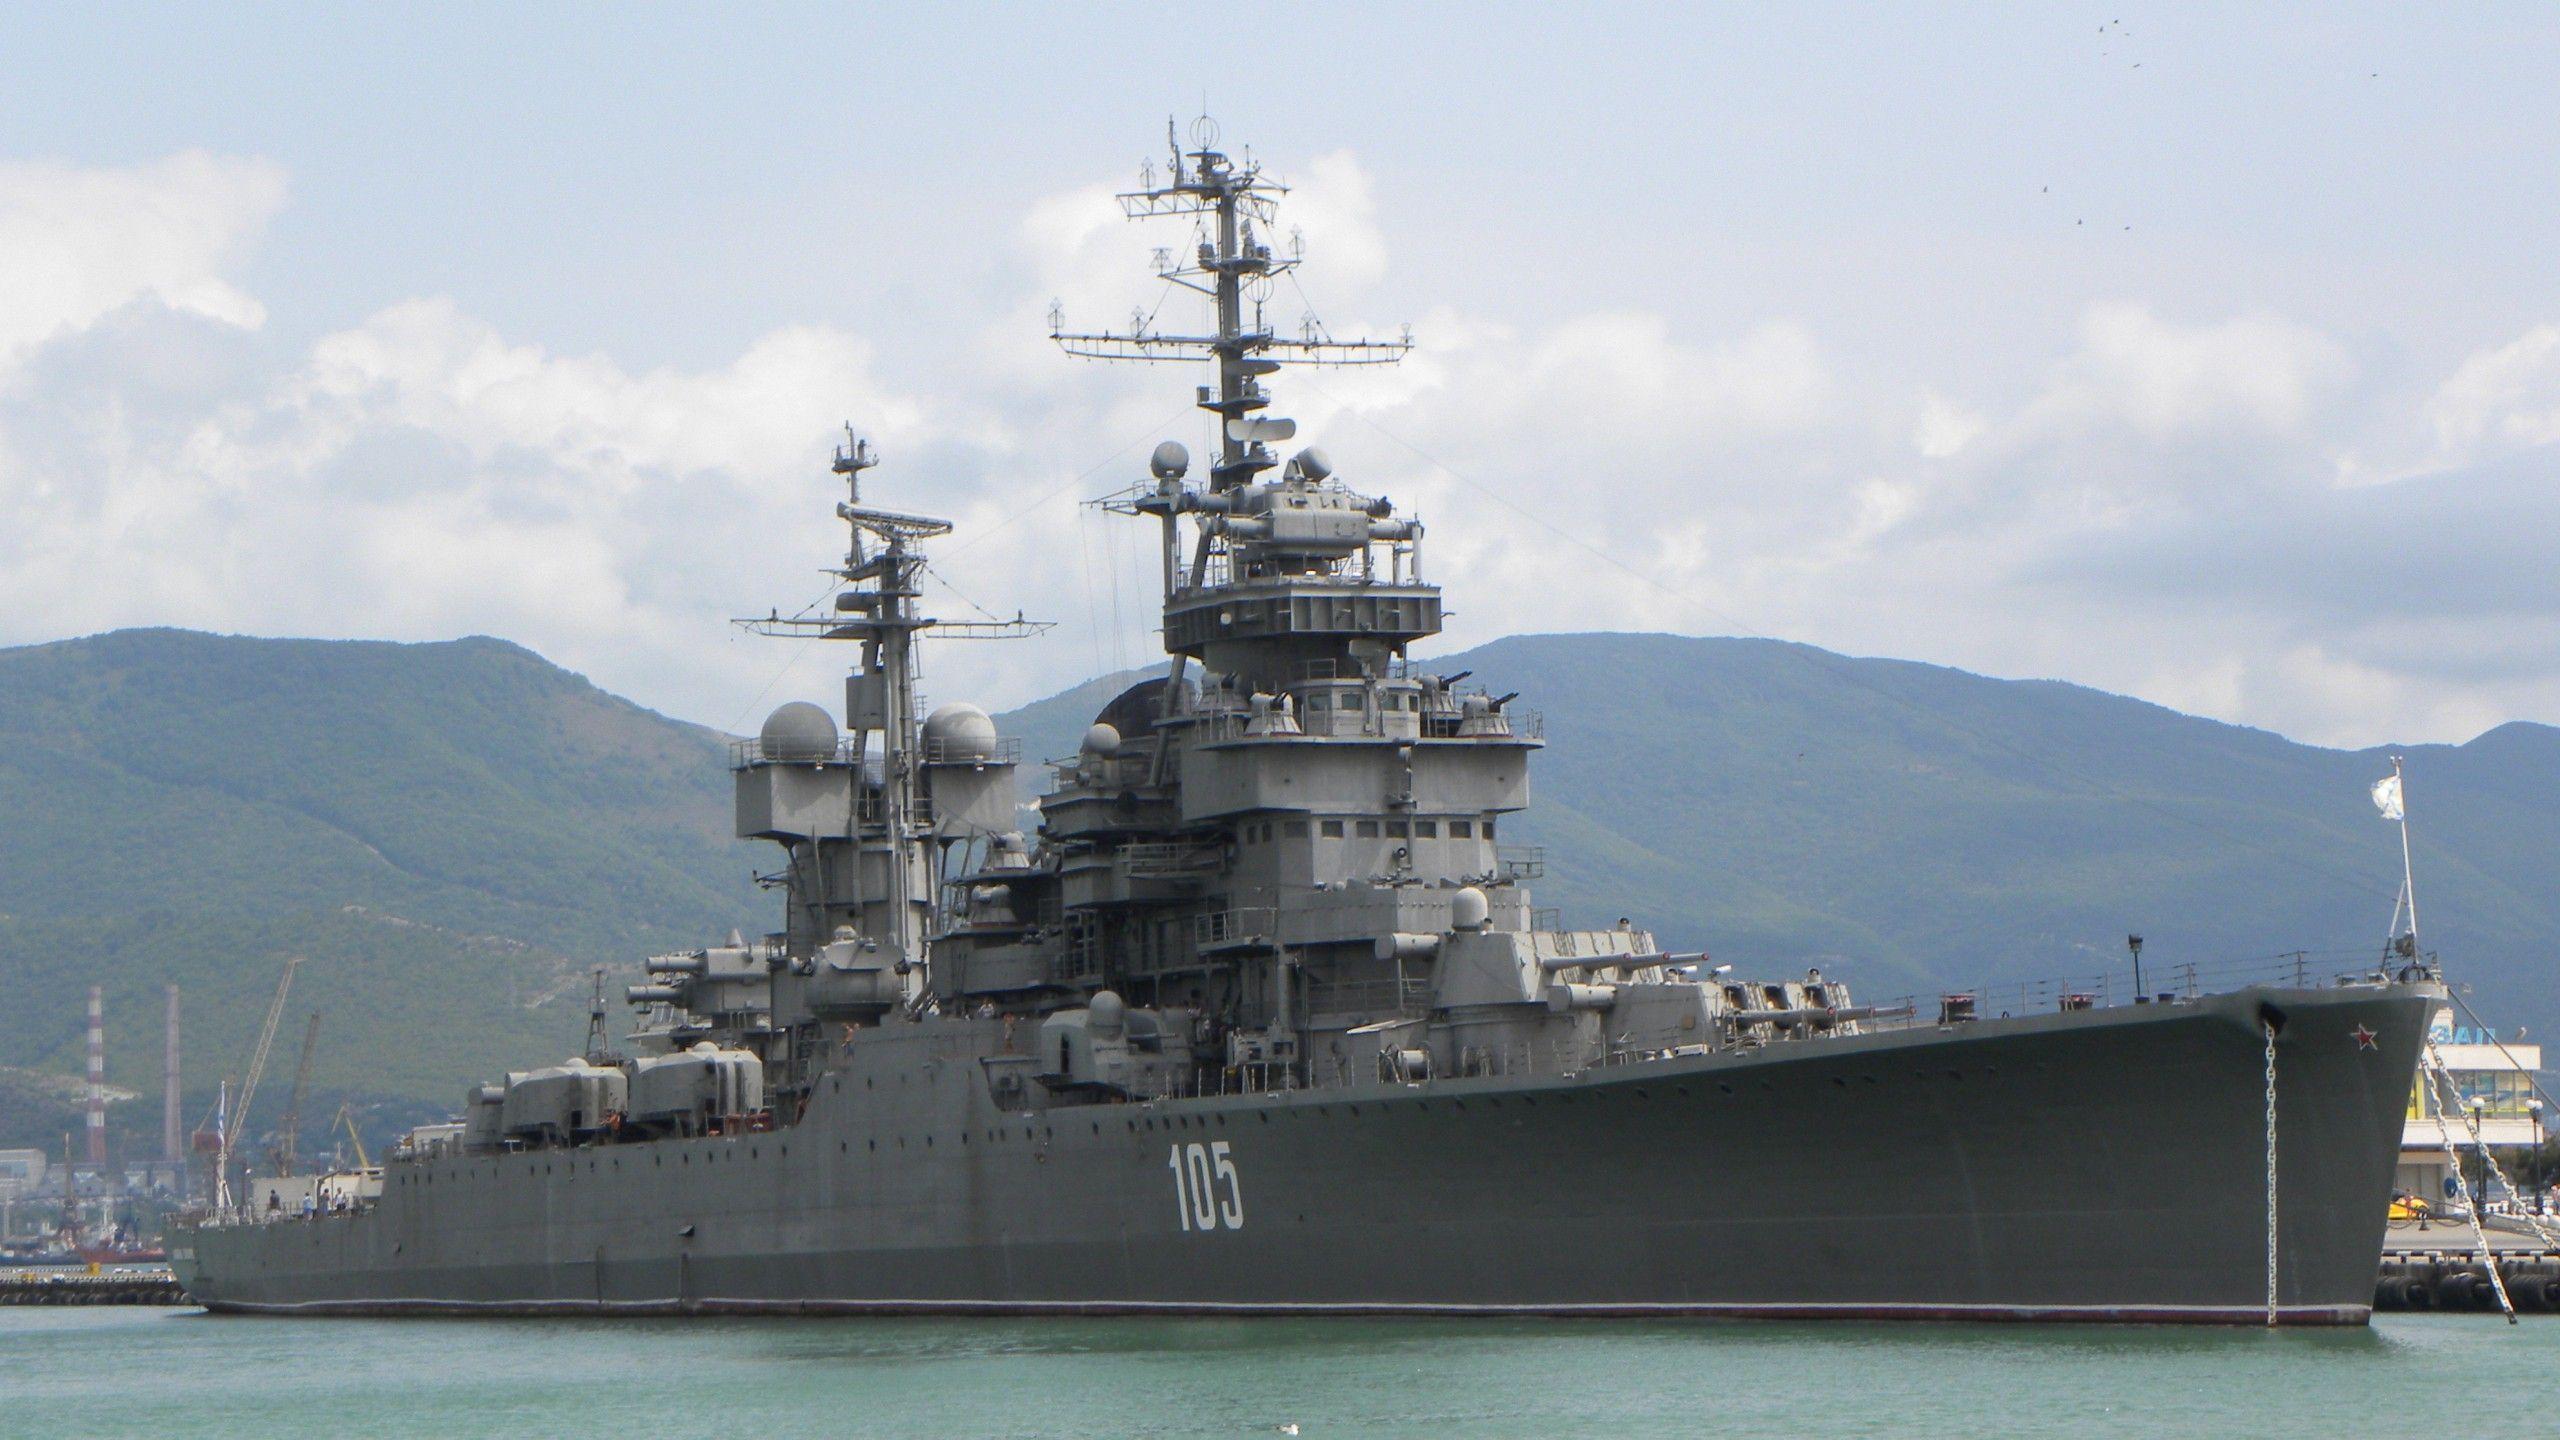 navy wallpaper 1440x900 ships - photo #9